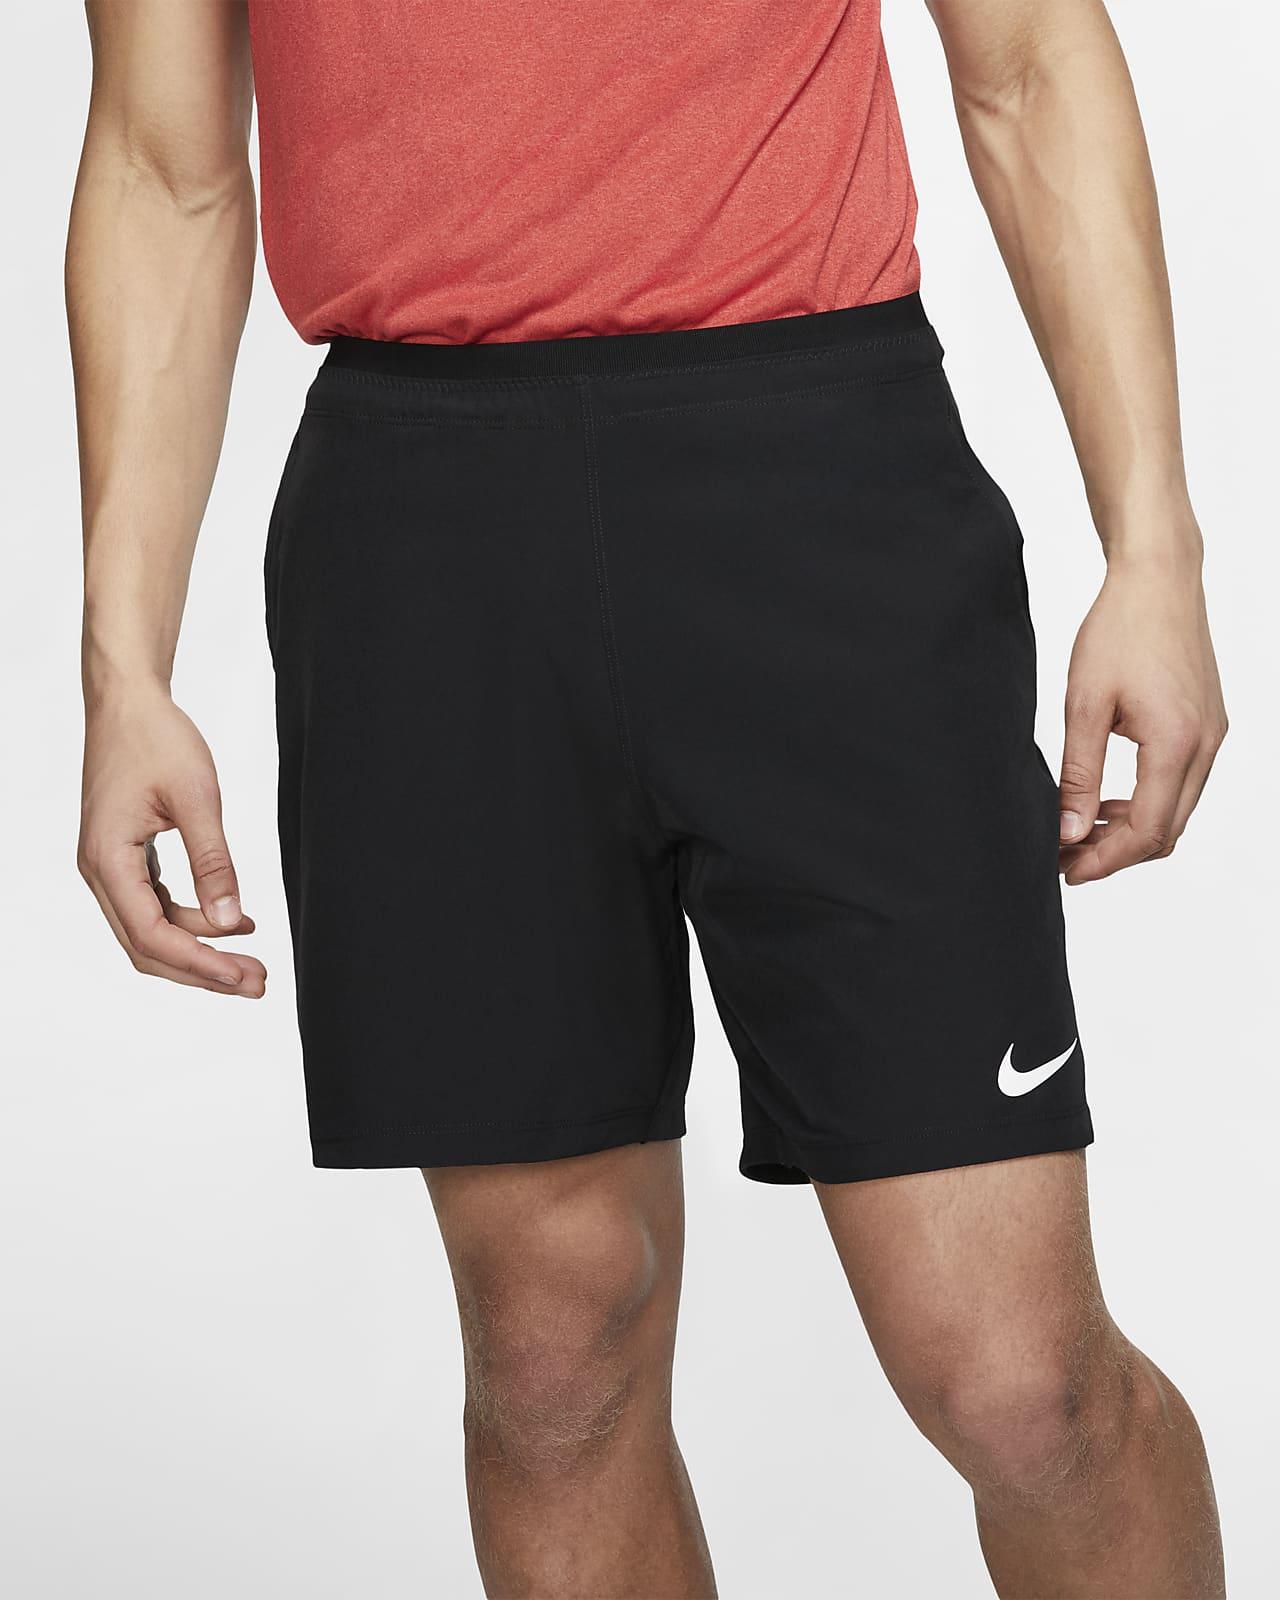 Nike Pro Flex Rep Pantalons curts - Home